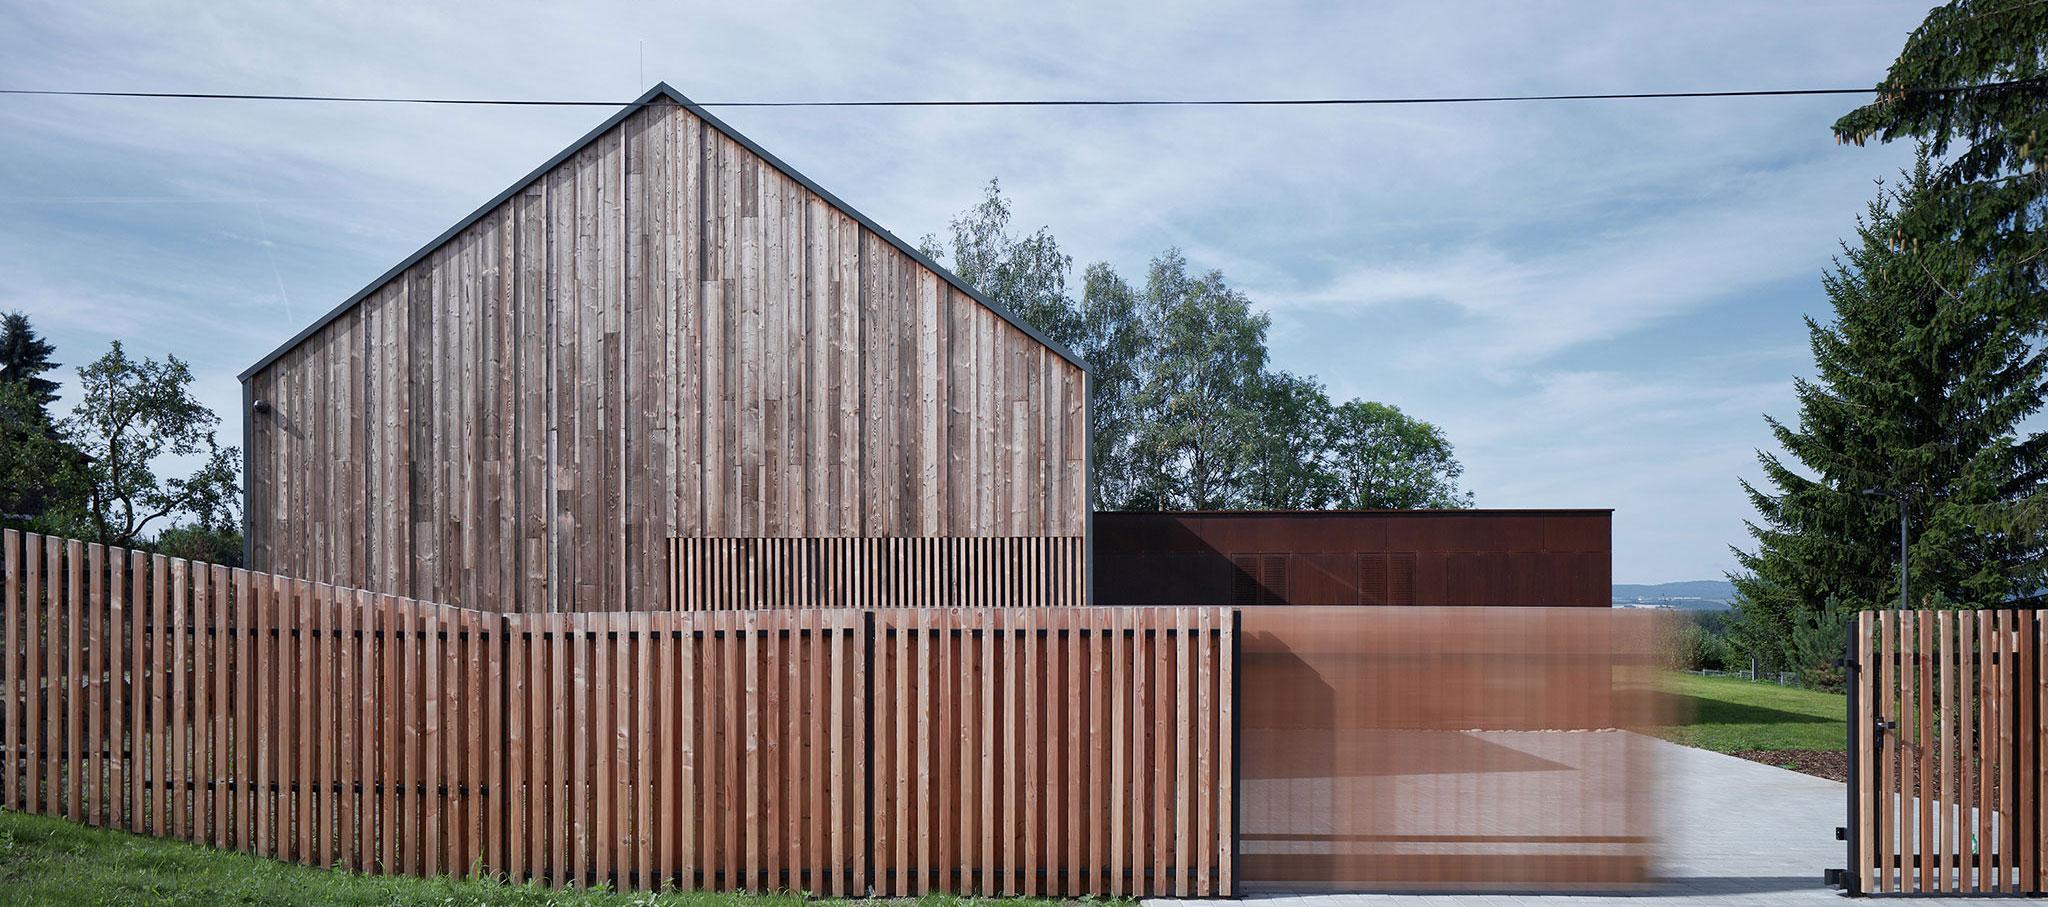 Engel House by CMC architects. Photograph © BoysPlayNice